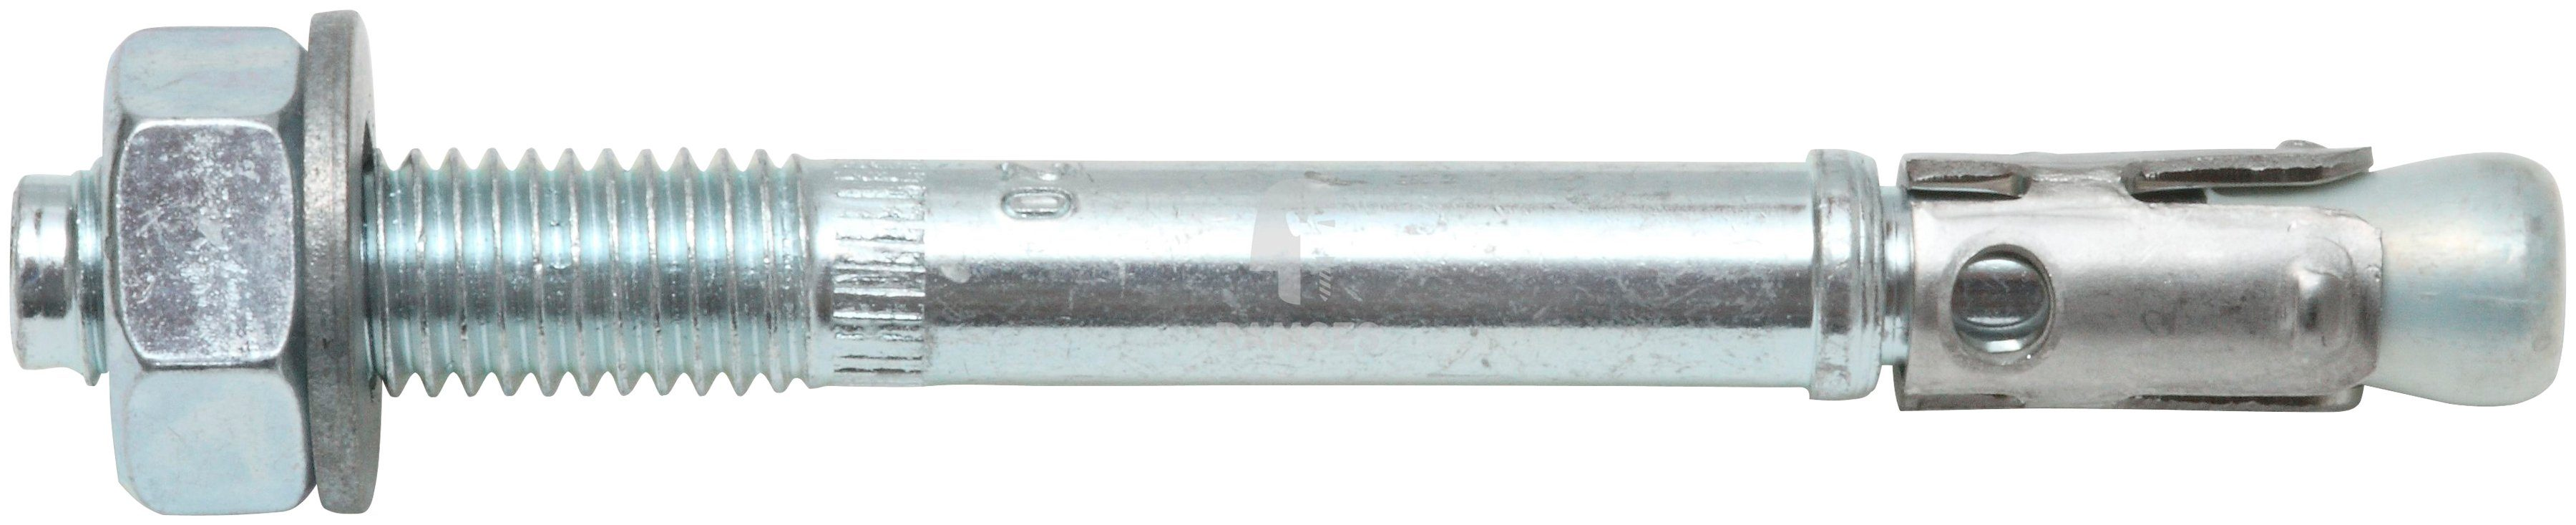 RAMSES Dübel , Bolzenanker BZ plus M10 x 100 mm, 10 Stück